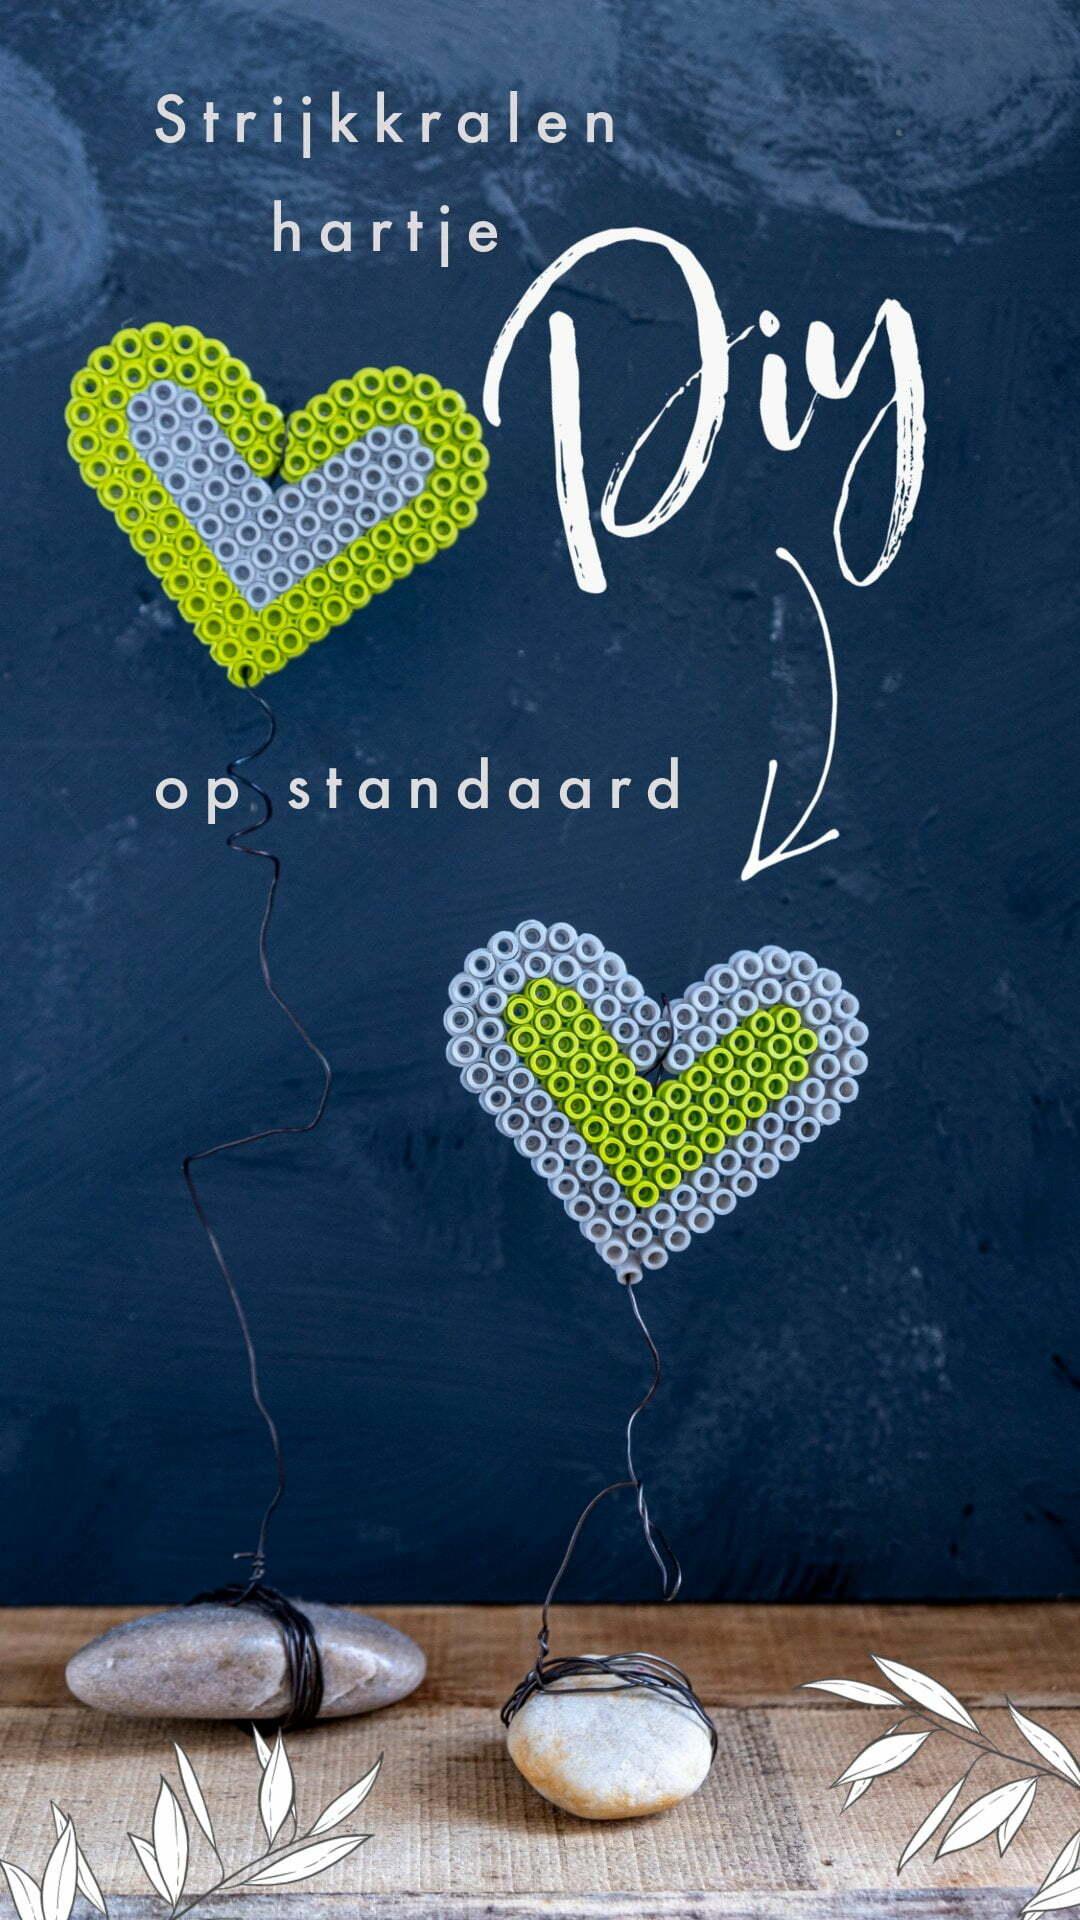 Pin: Strijkkralen hartje op standaard